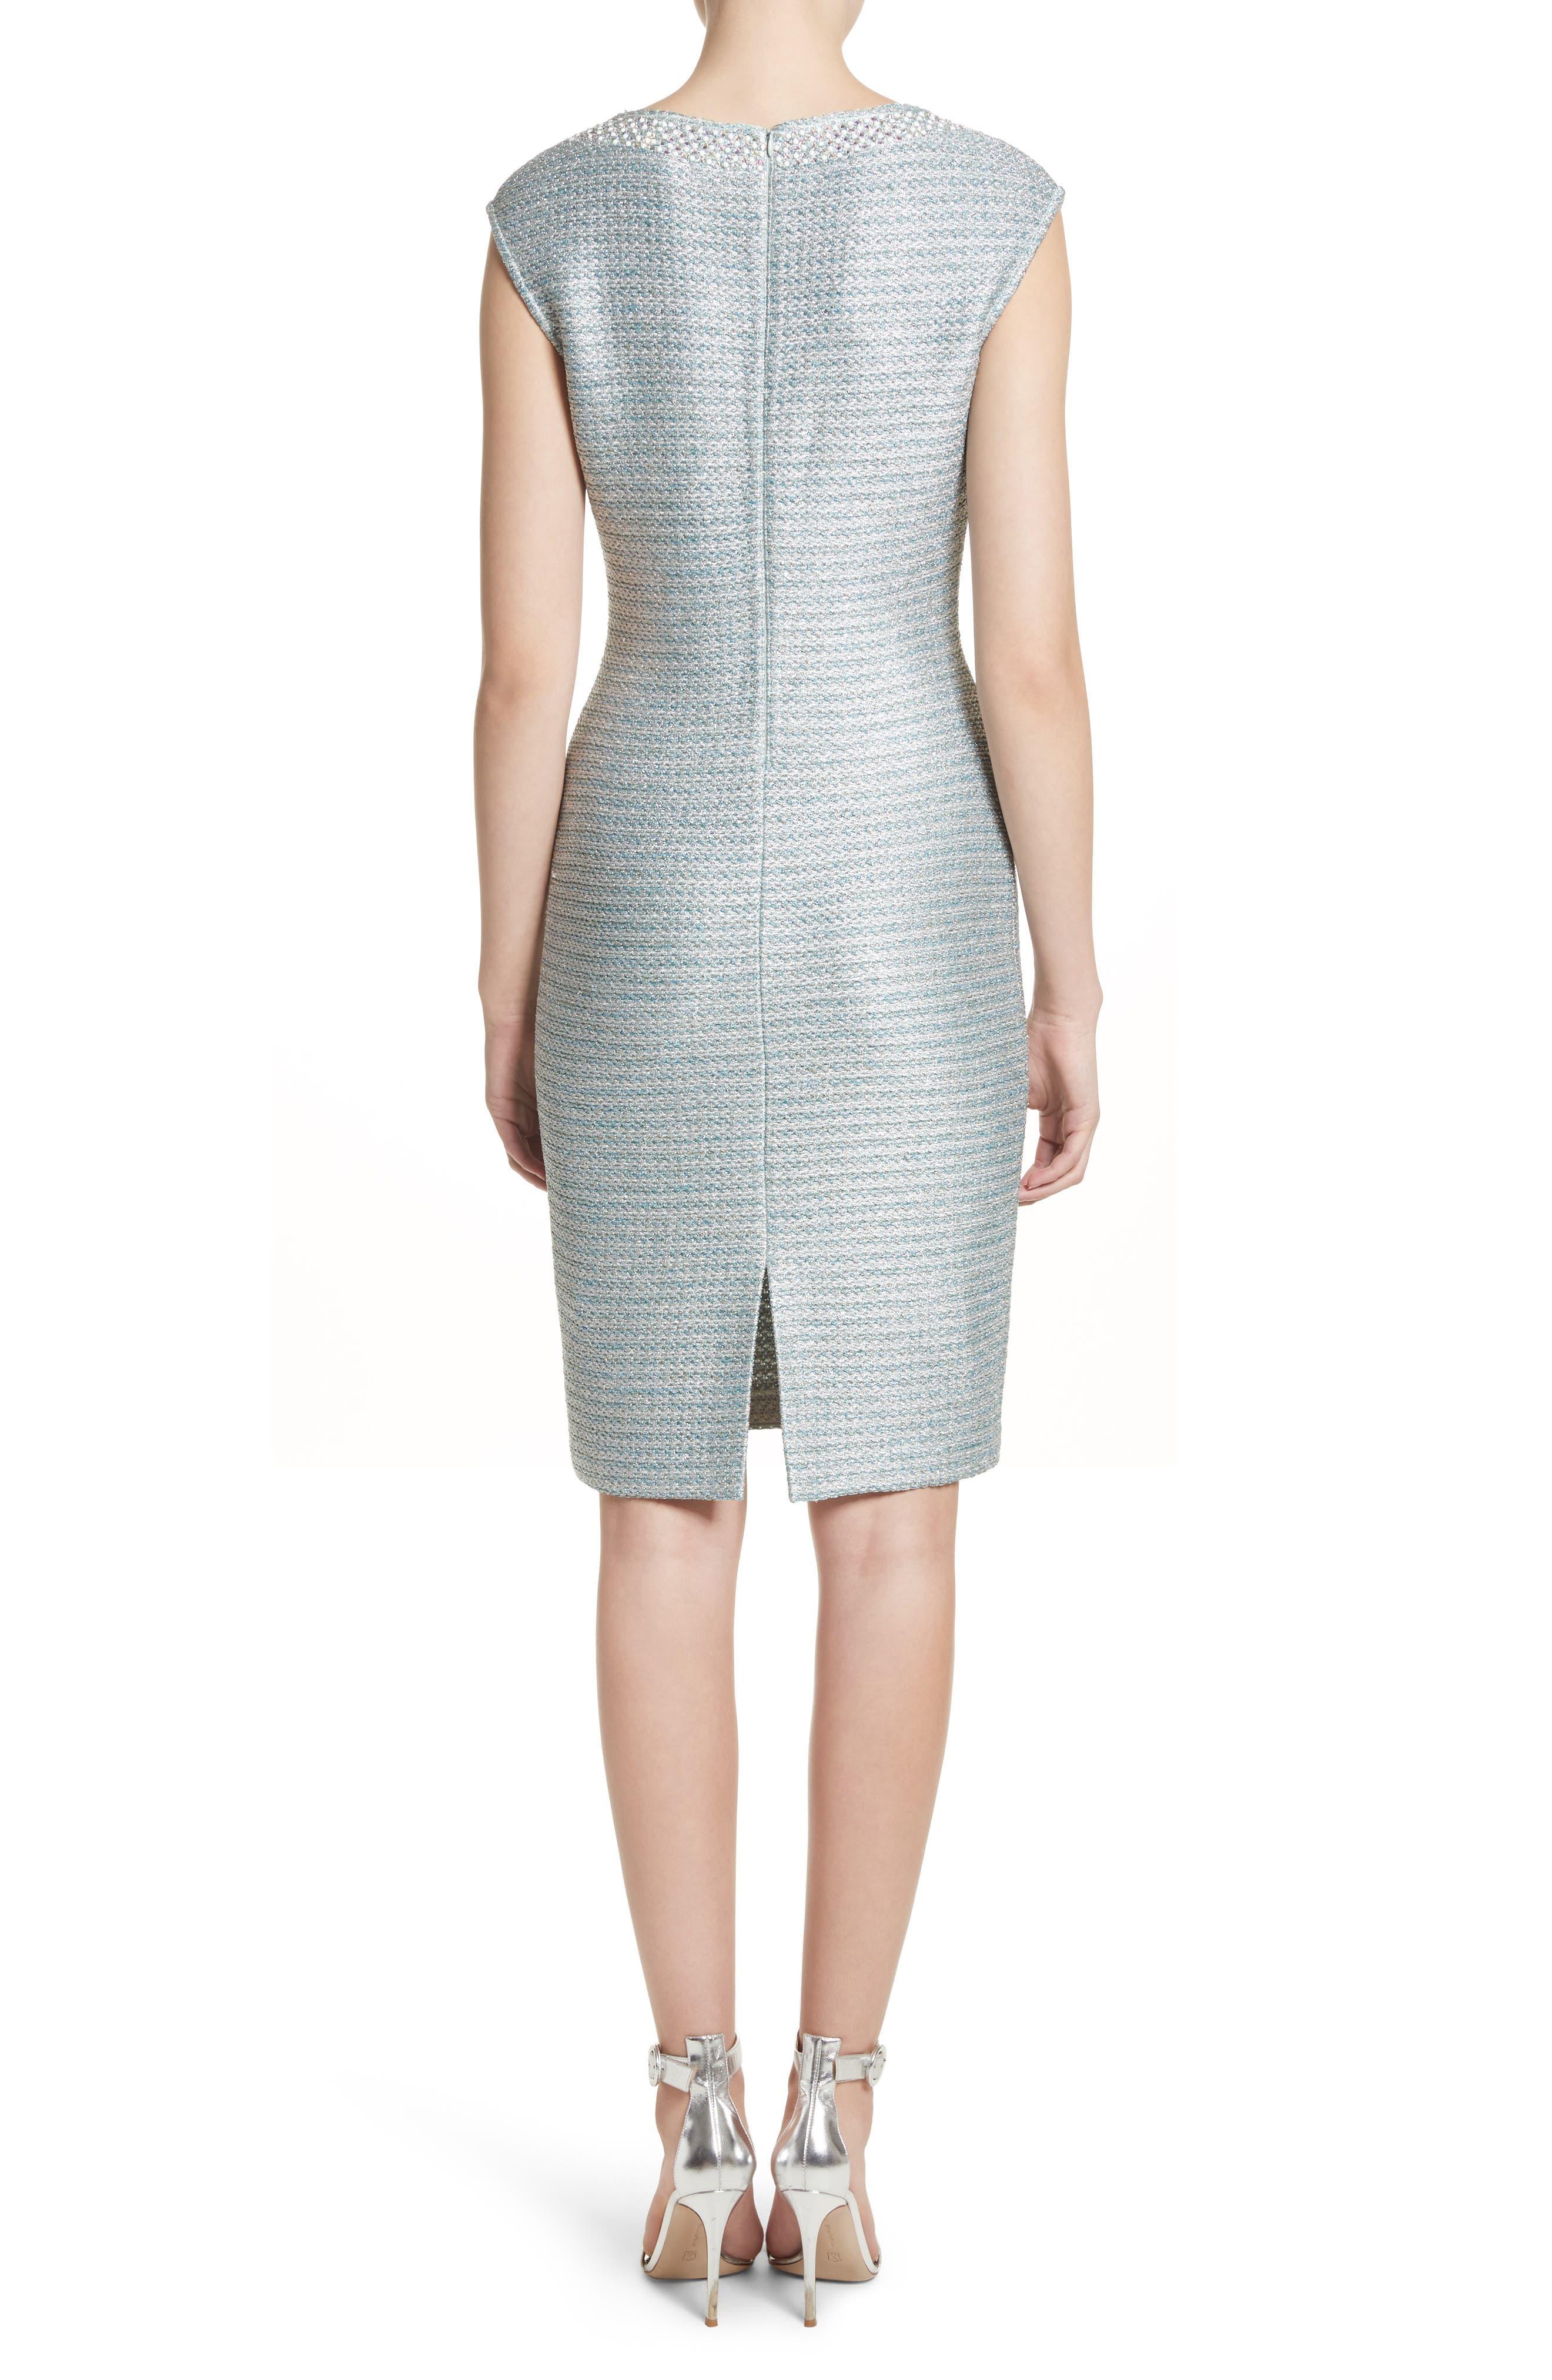 Alternate Image 2  - St. John Collection Gleam Metallic Knit Sheath Dress